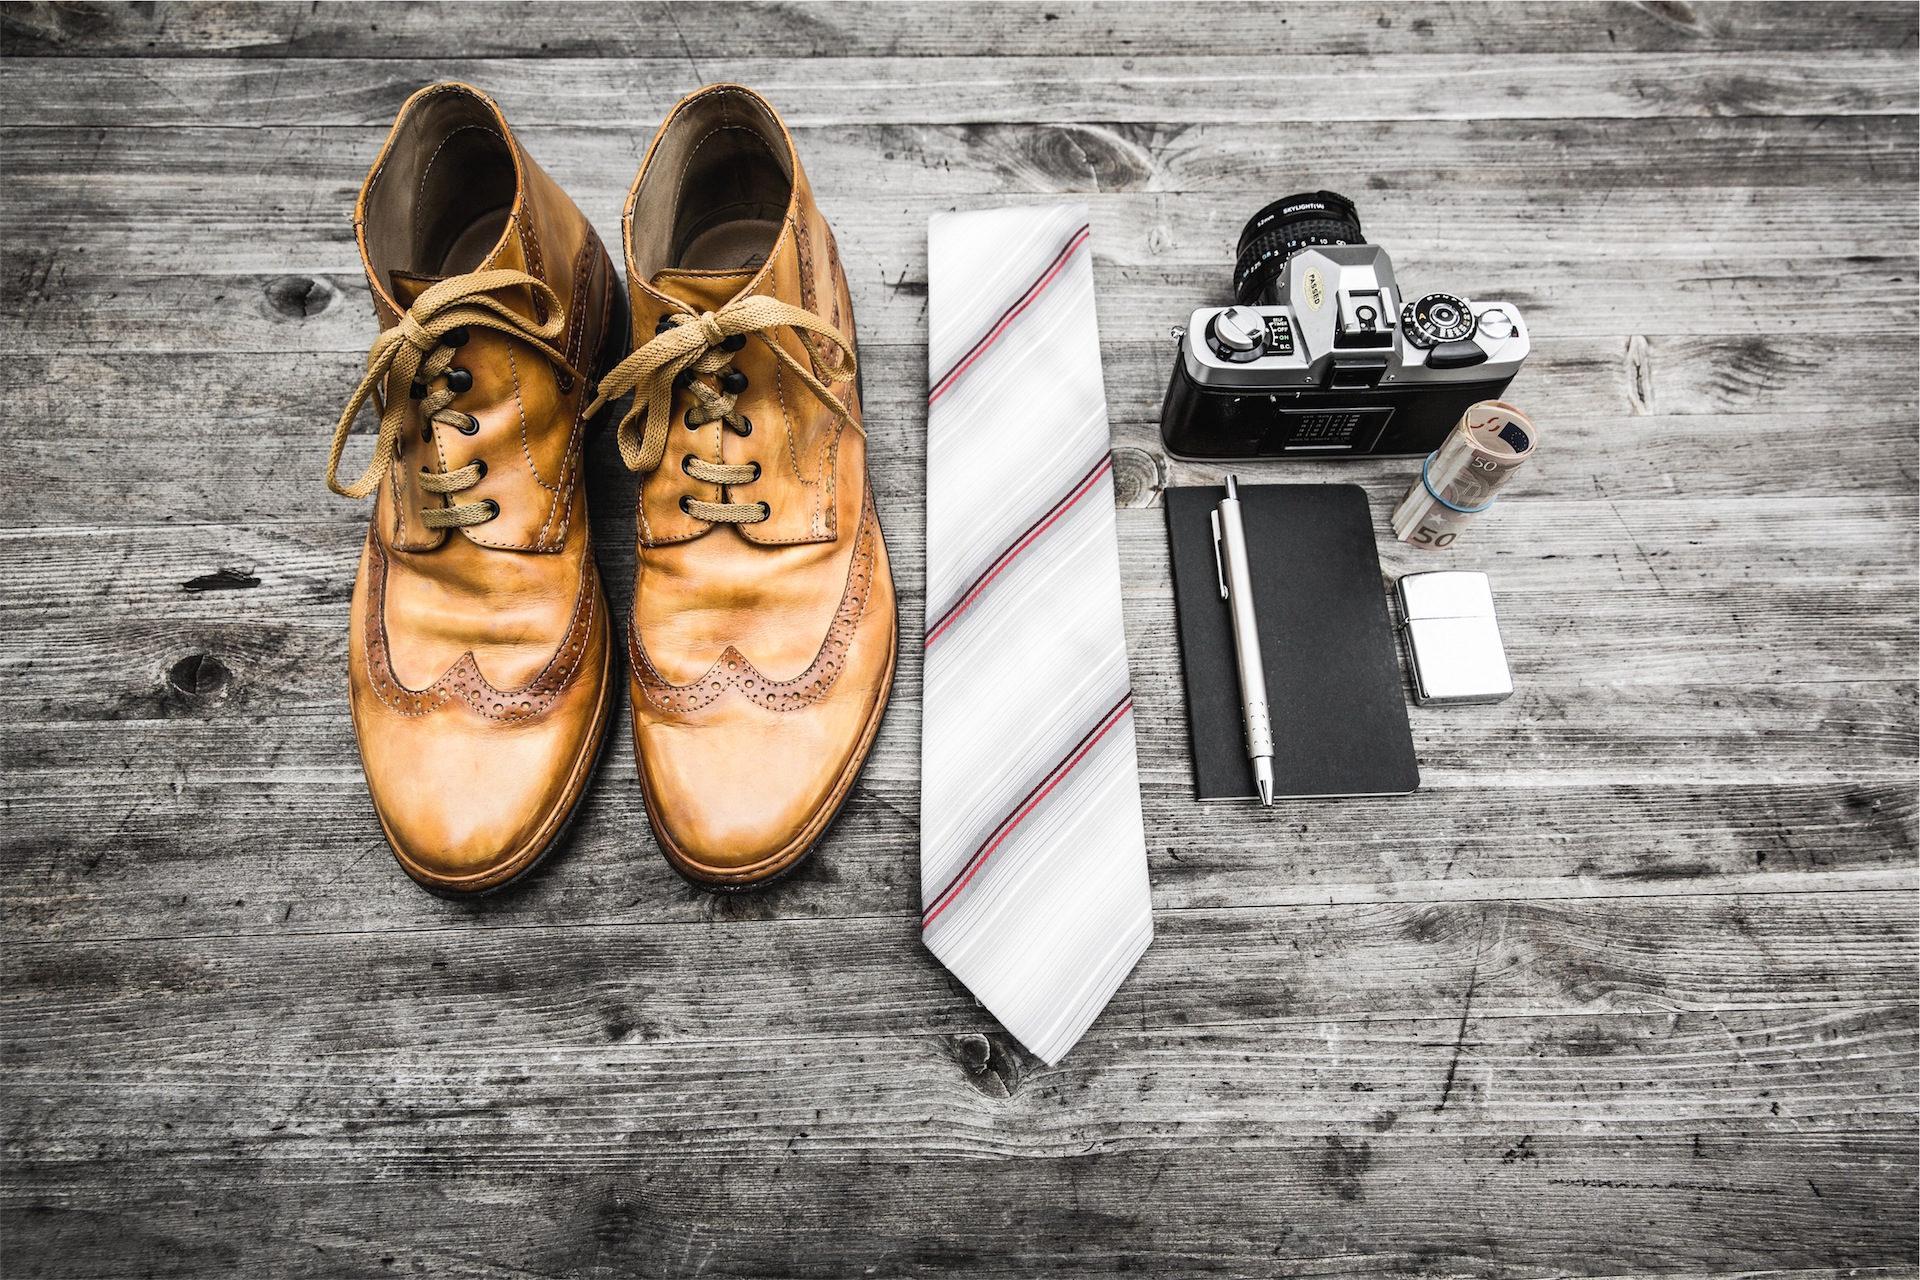 Stiefel, Tagesordnung, Krawatte, Kamera, Holz - Wallpaper HD - Prof.-falken.com